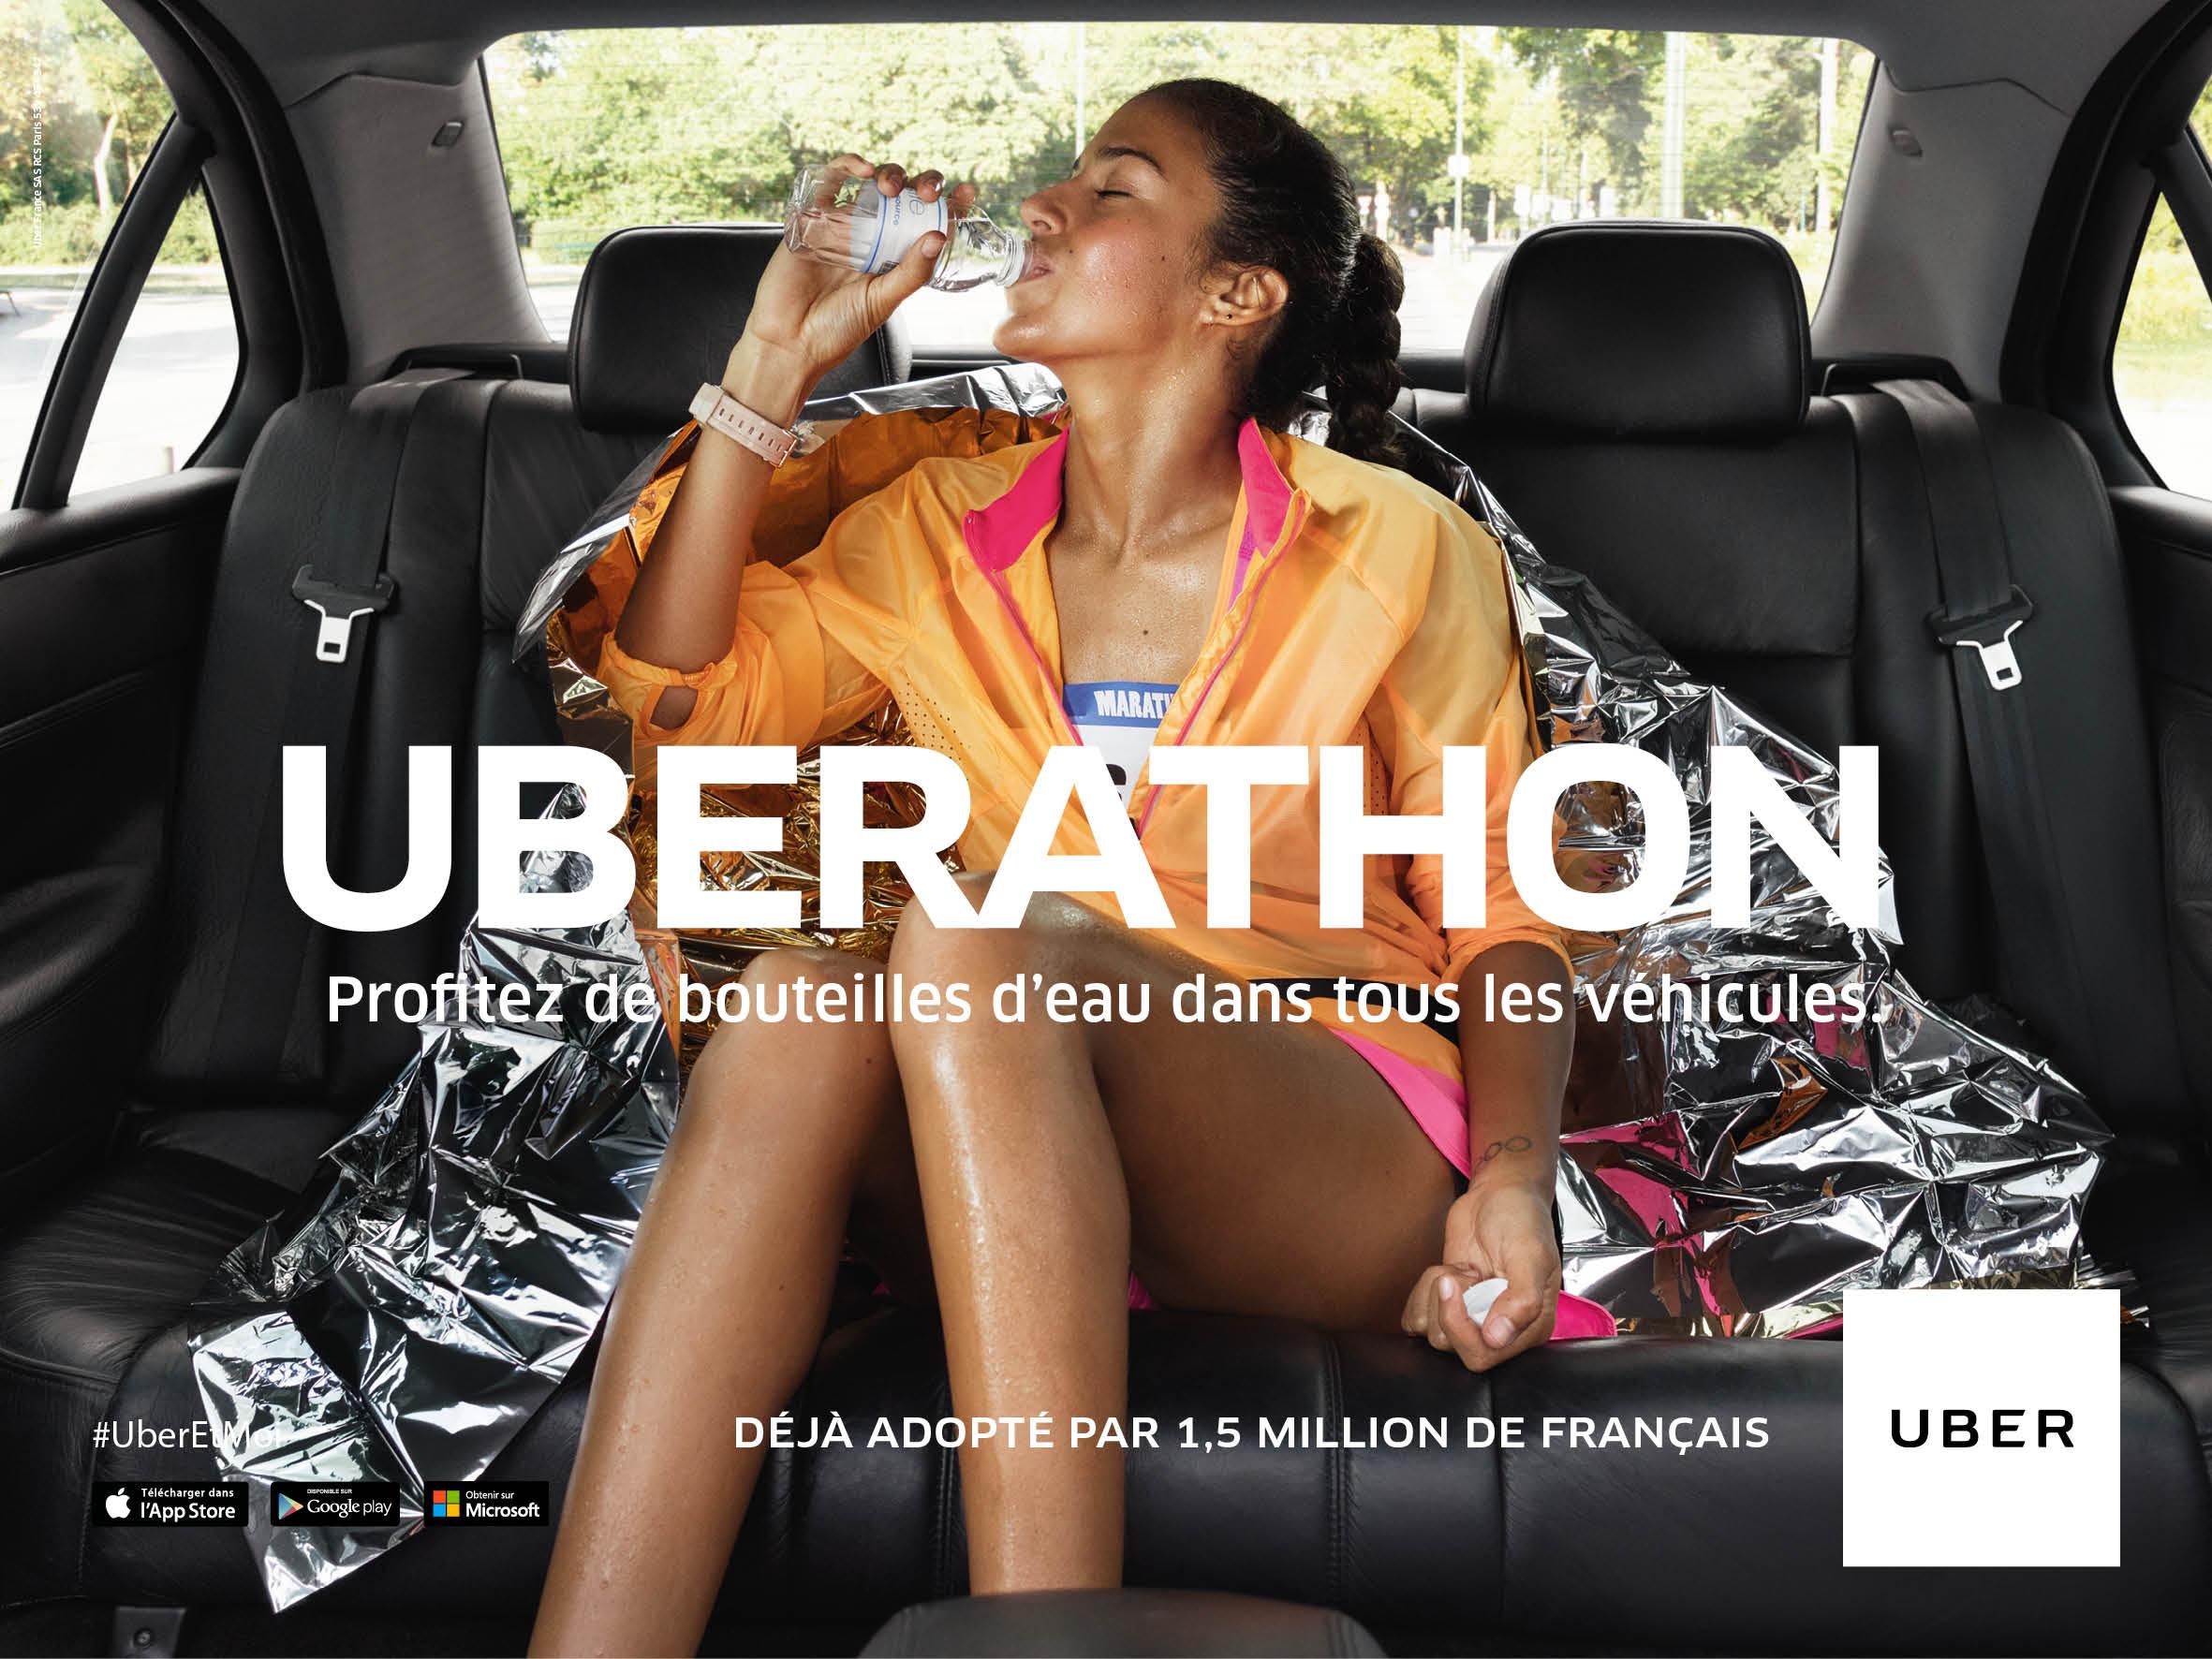 uber-france-publicite-marketing-application-utilisateurs-passagers-mars-2016-agence-marcel-publicis-12